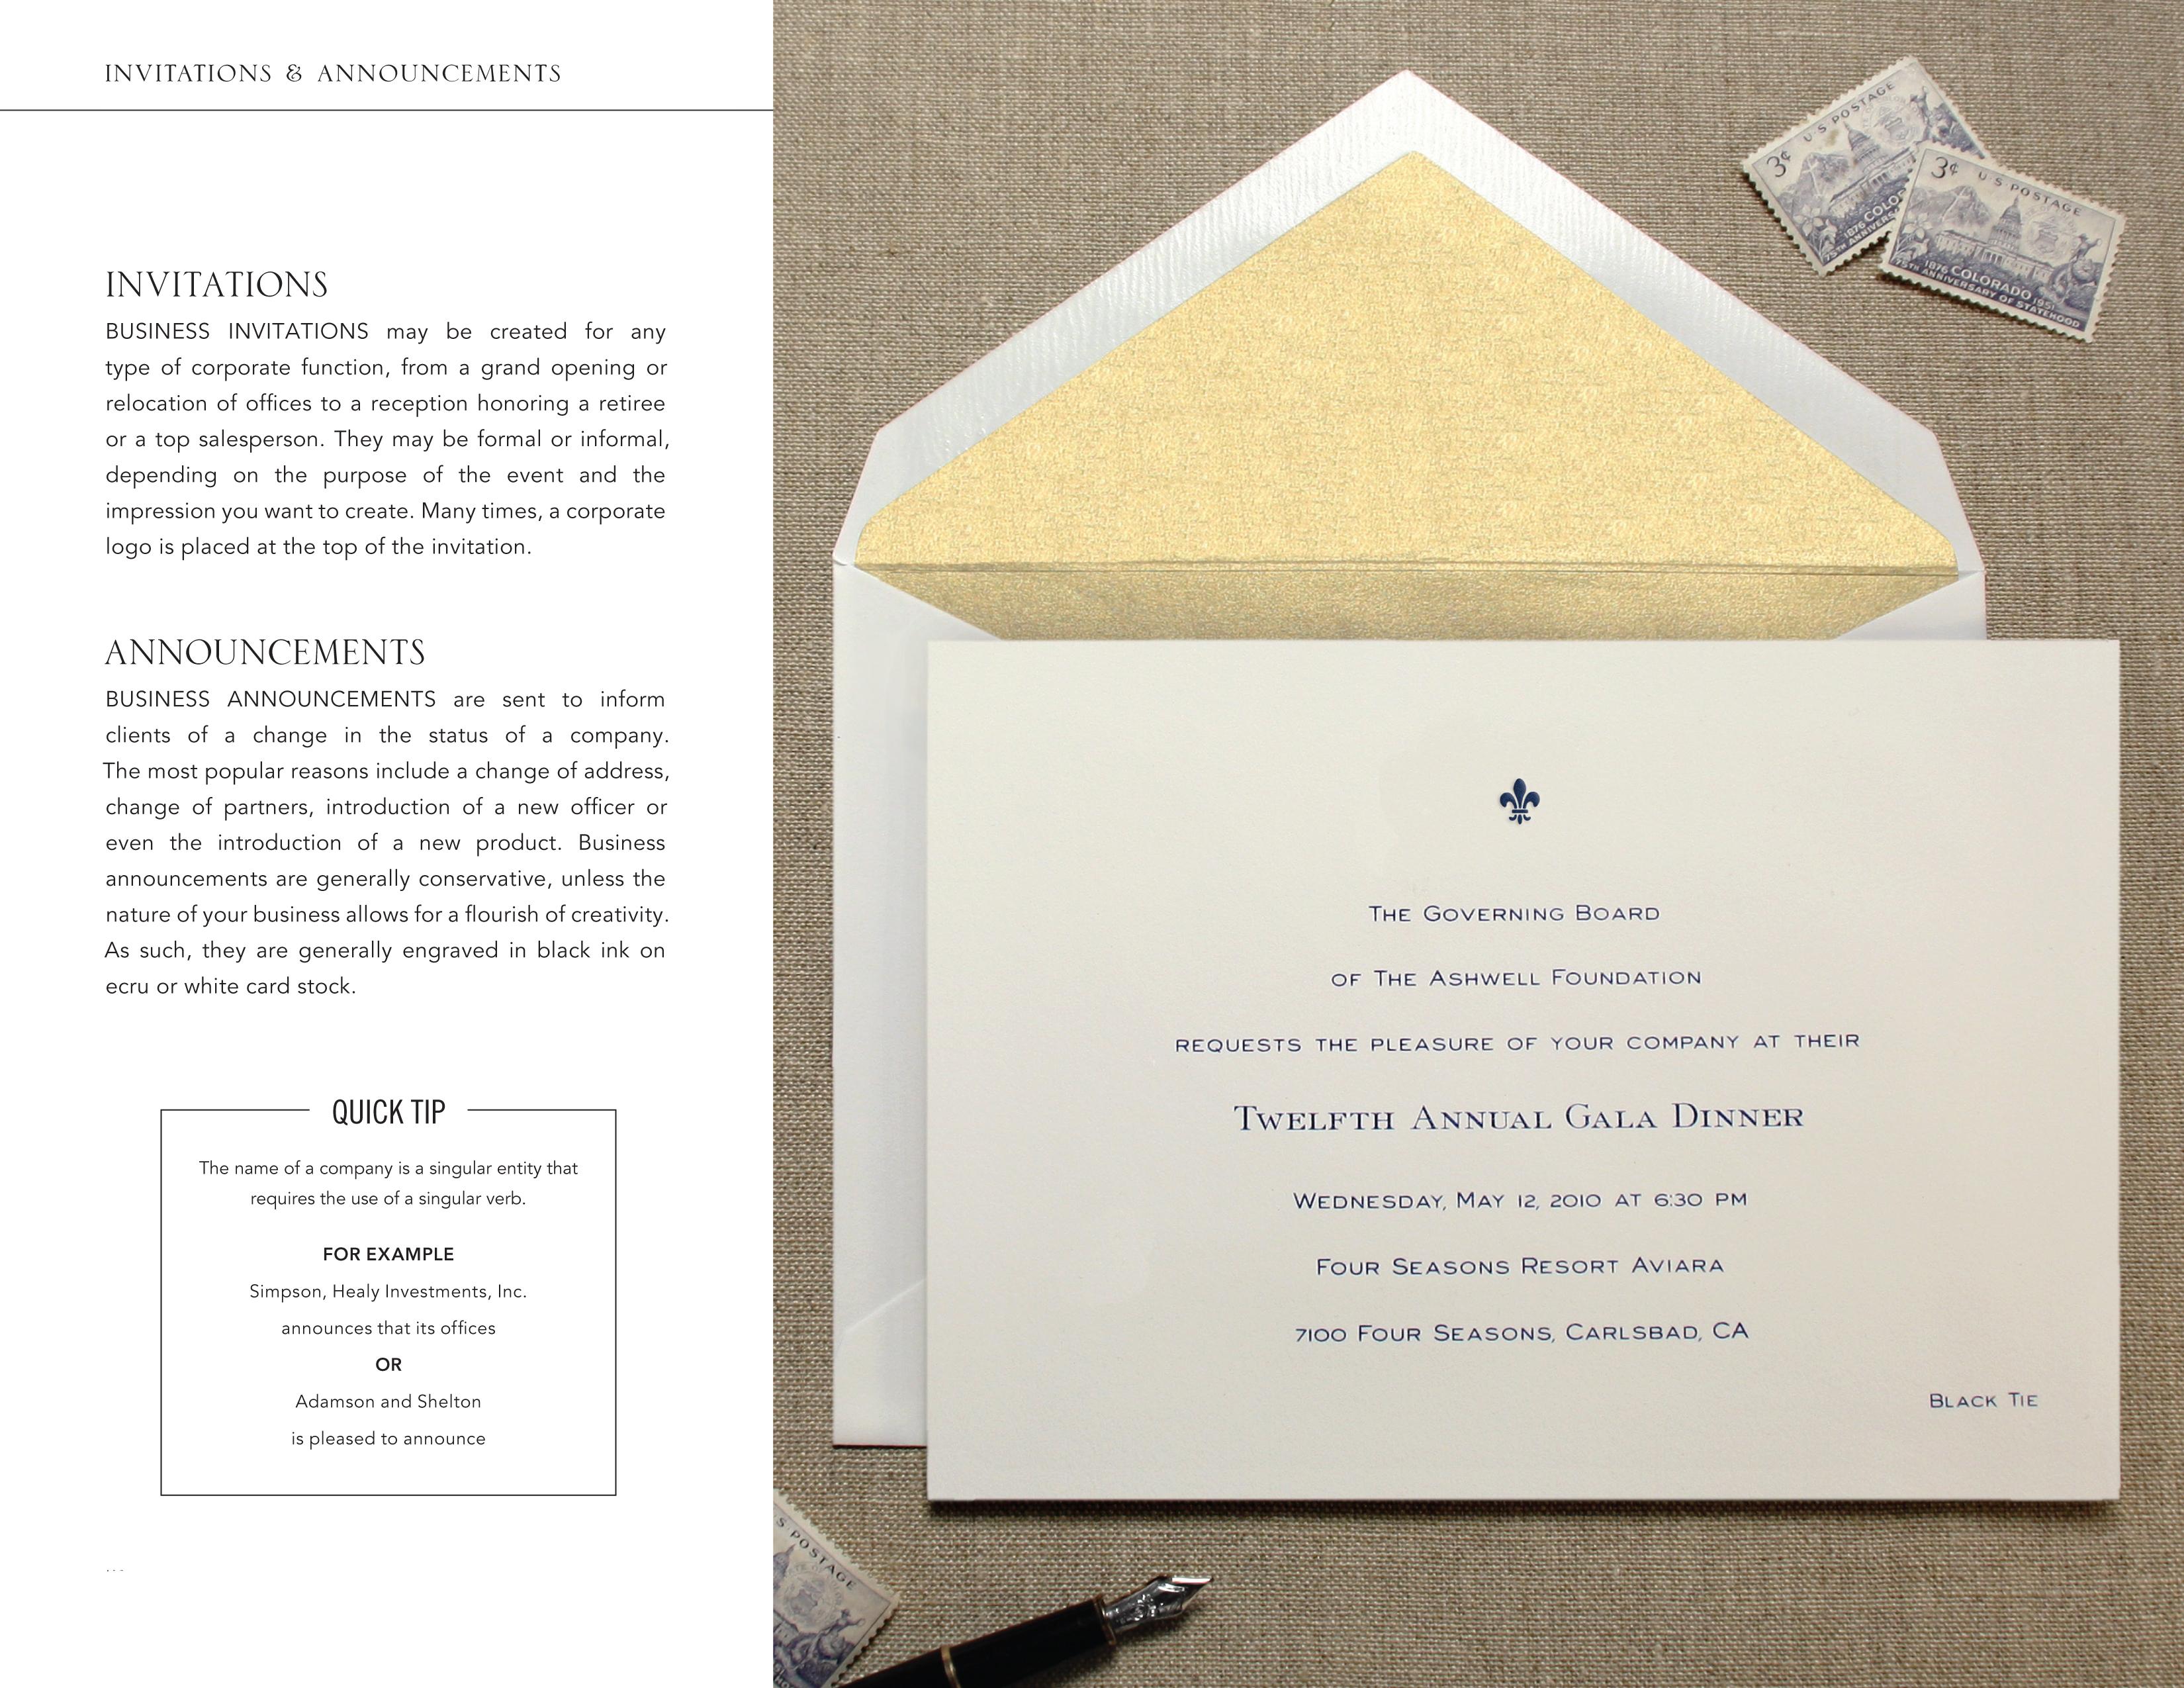 Money Instead Of Wedding Gift Wording : Ideas. Money Instead Of Wedding Gifts. skinnycargopantsaddict wedding ...